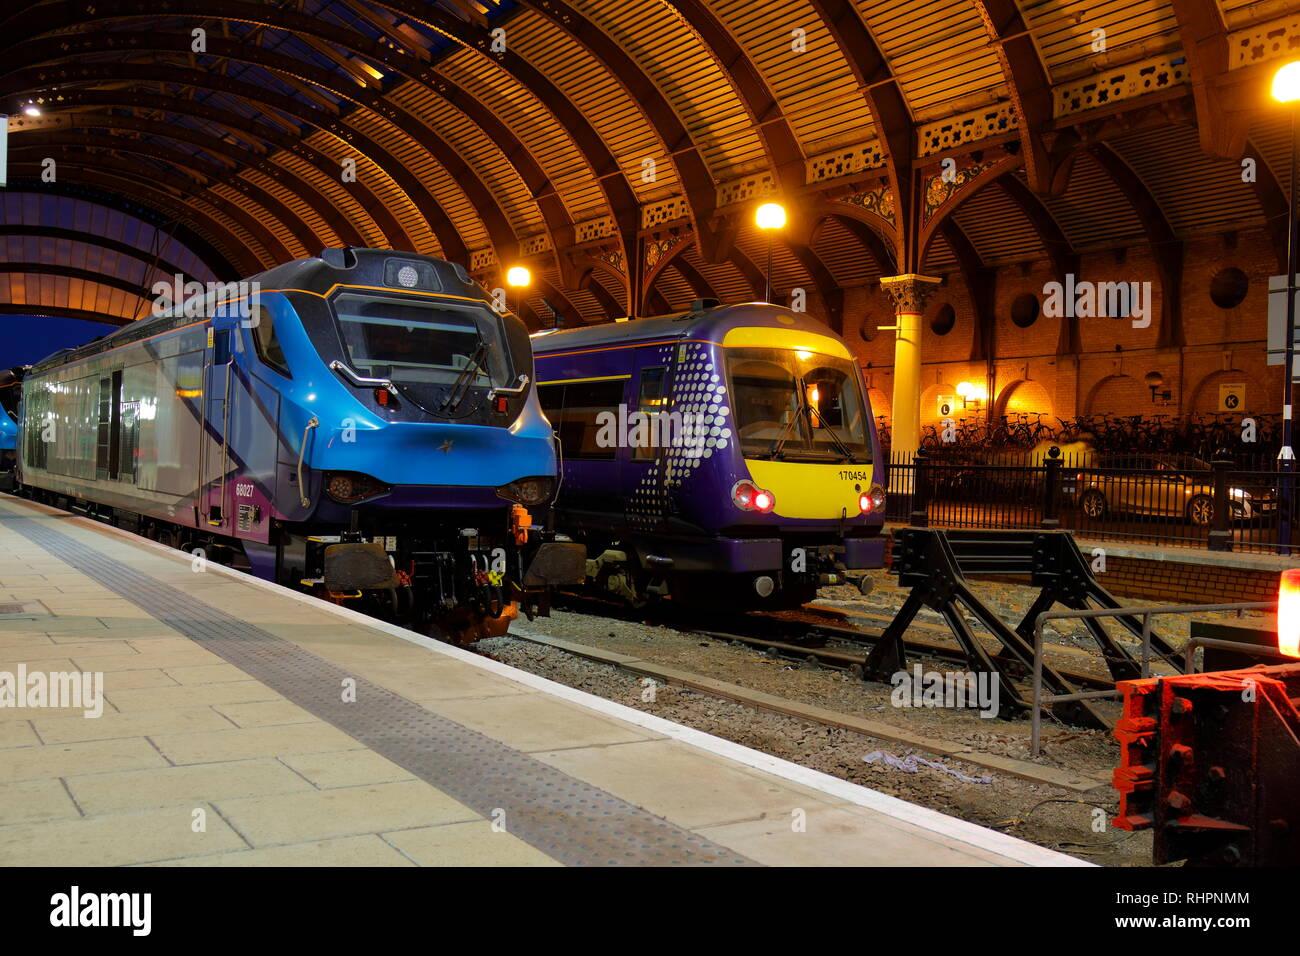 Transpennine Express 68027 & Scot Rail 170454 parked side by side at York Station - Stock Image